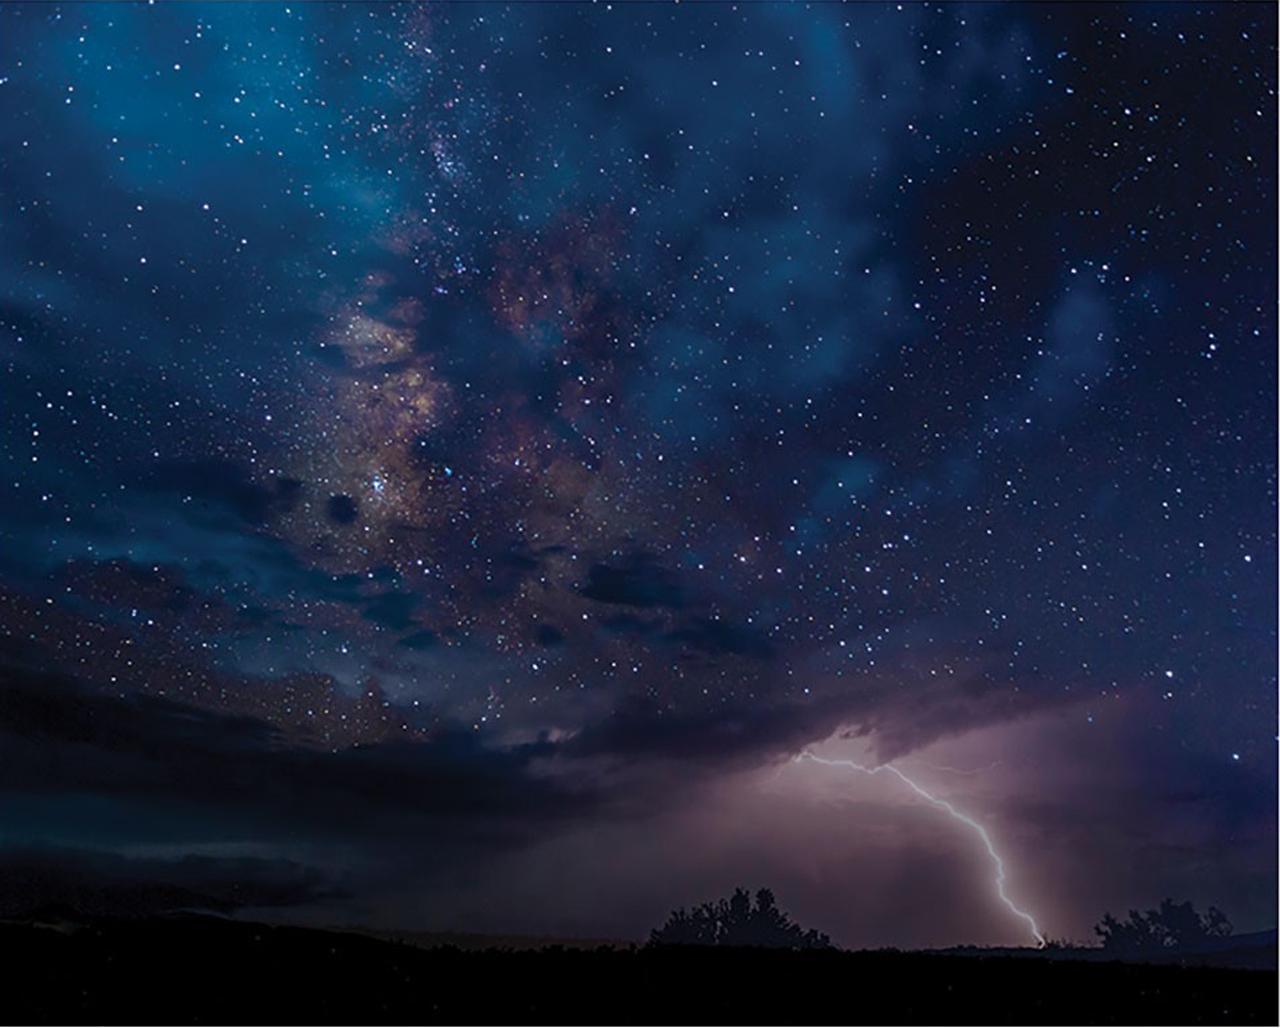 Night Sky Drama Landscape Jigsaw Puzzle